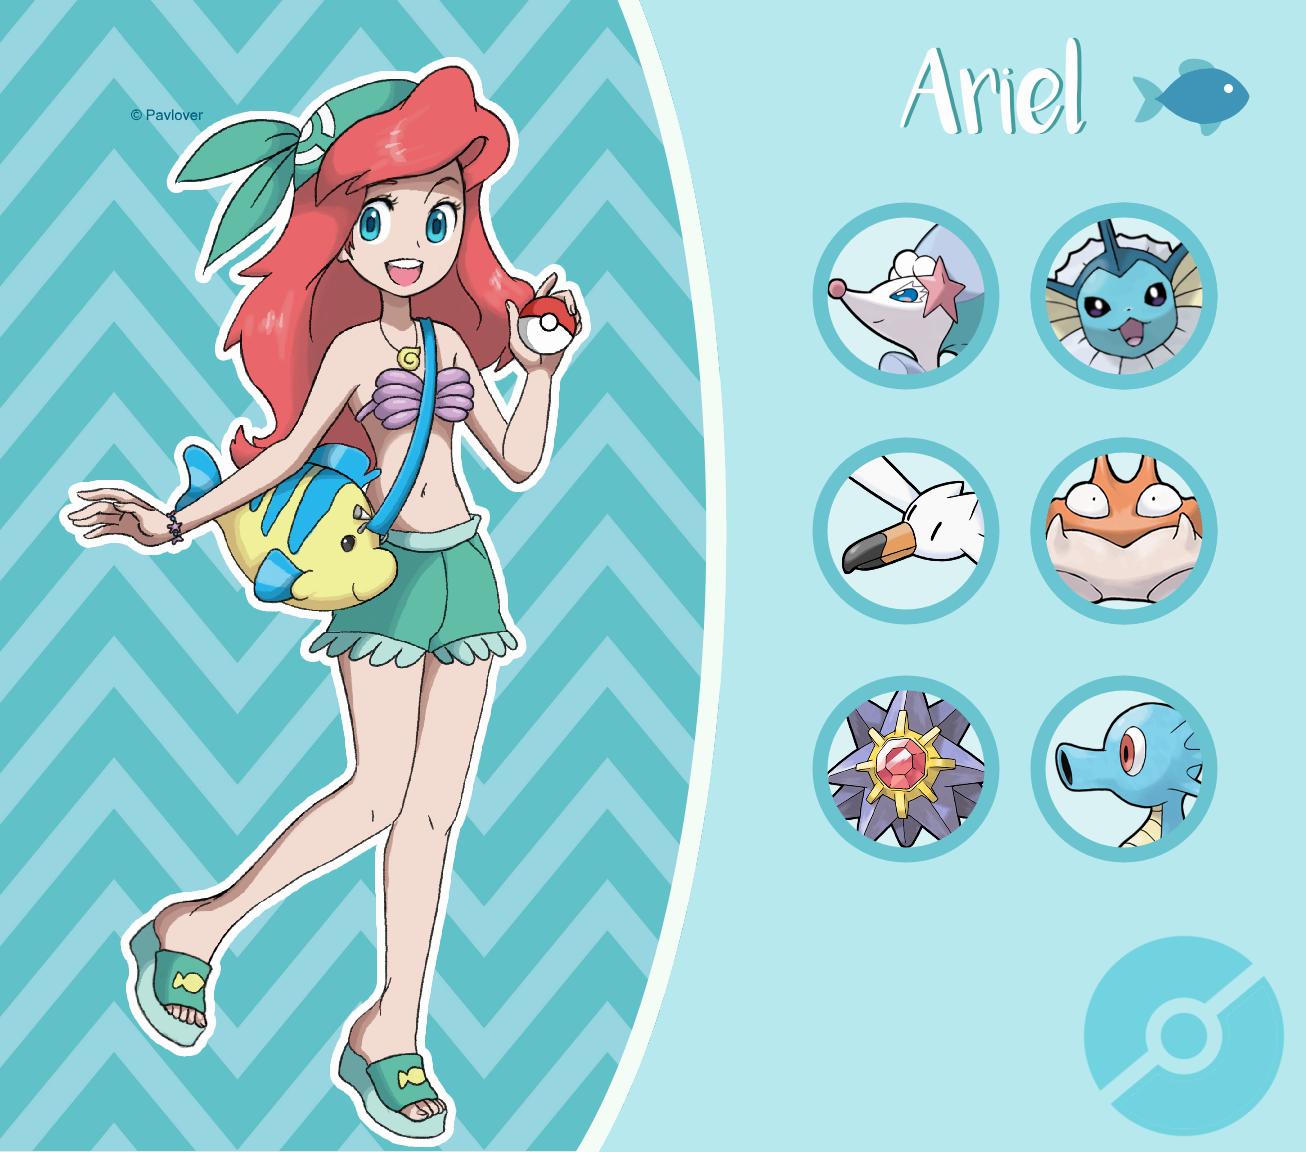 Disney Pokemon trainer : Ariel by Pavlover